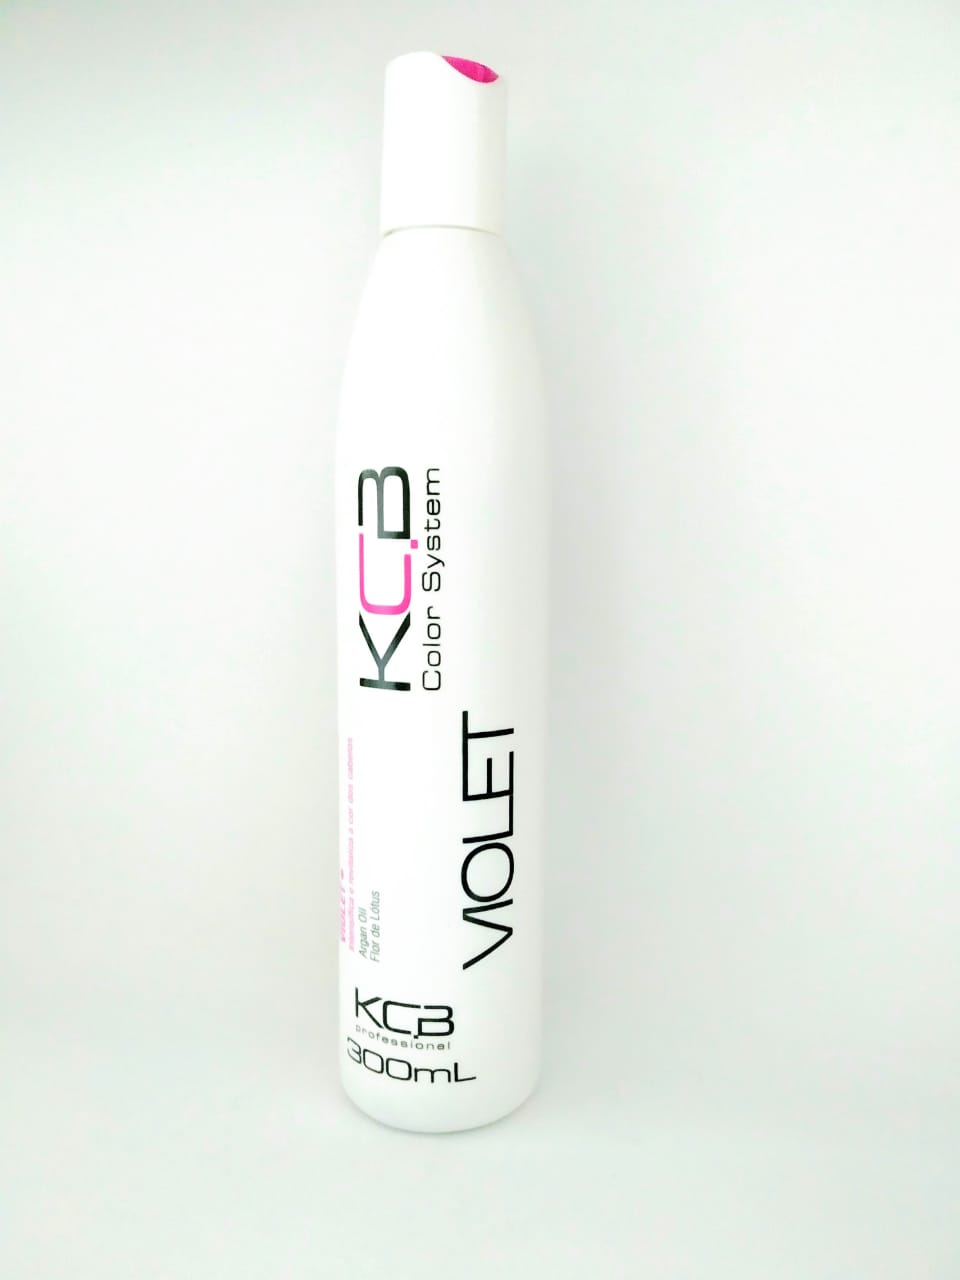 Mascara Tonalizante Violet - KCB 300ml